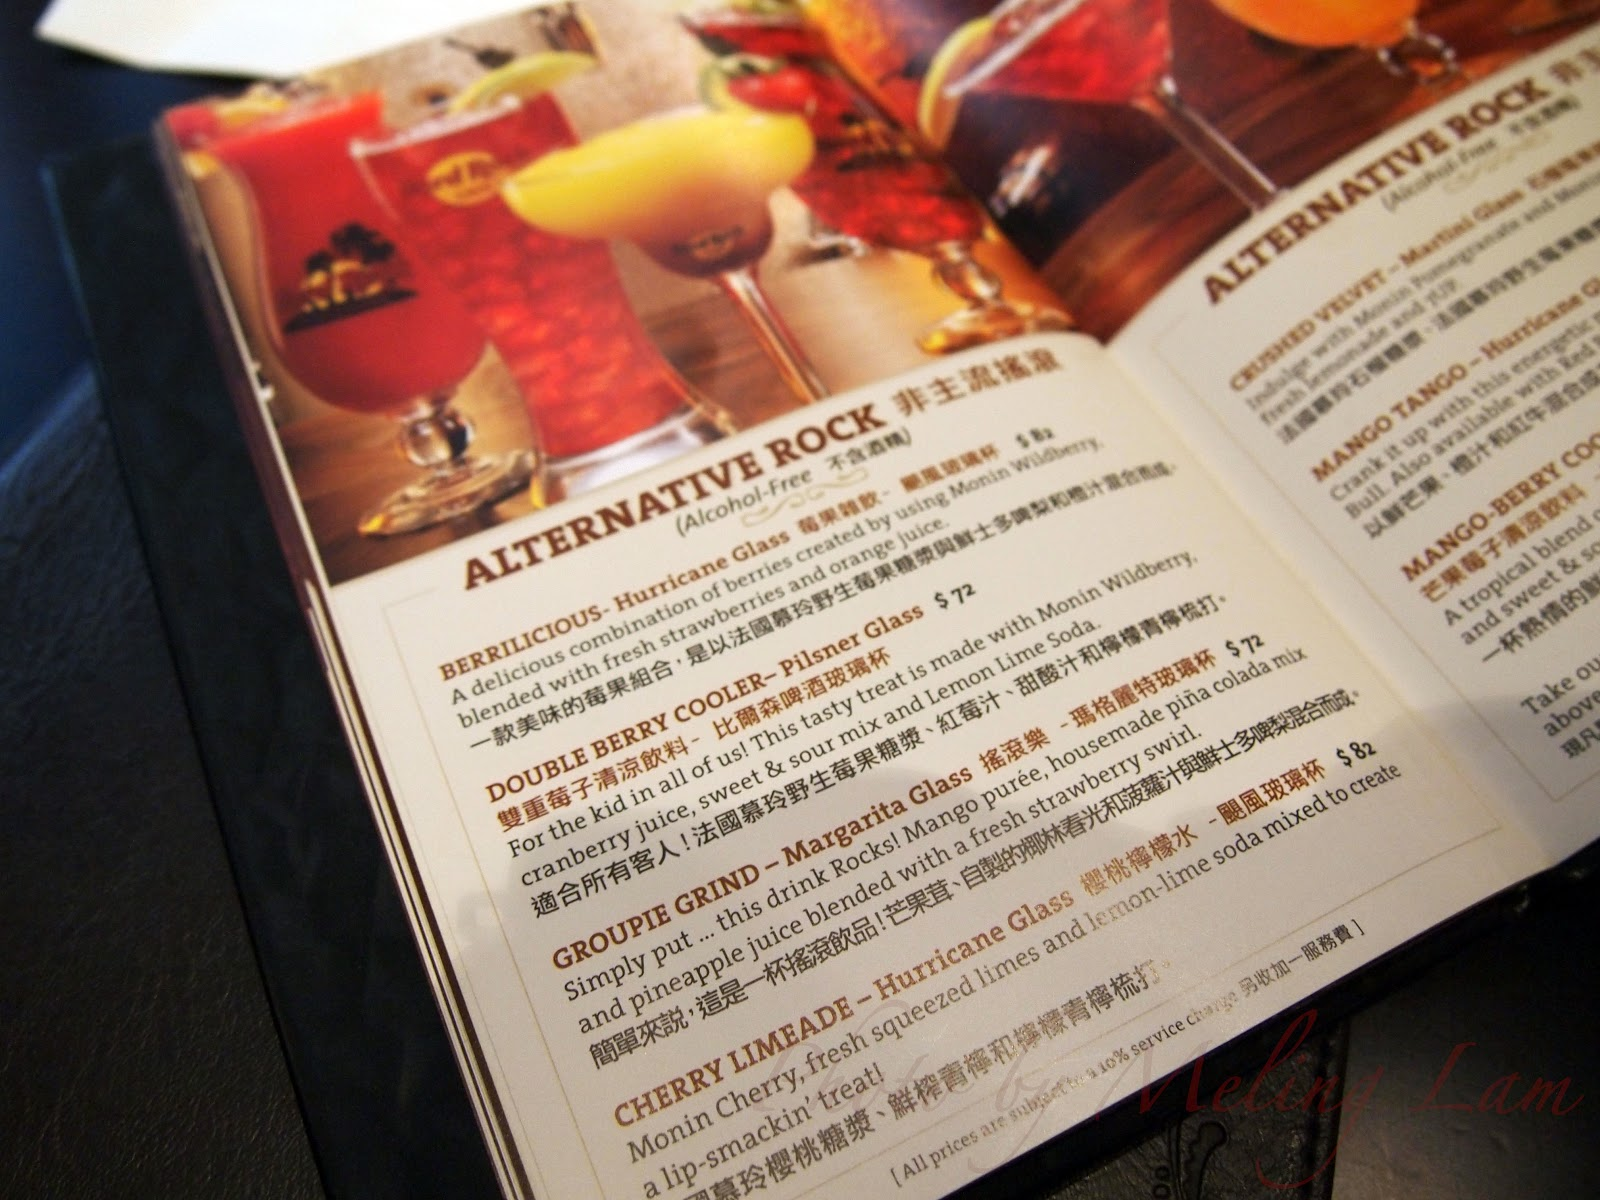 Hard Rock Cafe Times Square Cocktail Menu